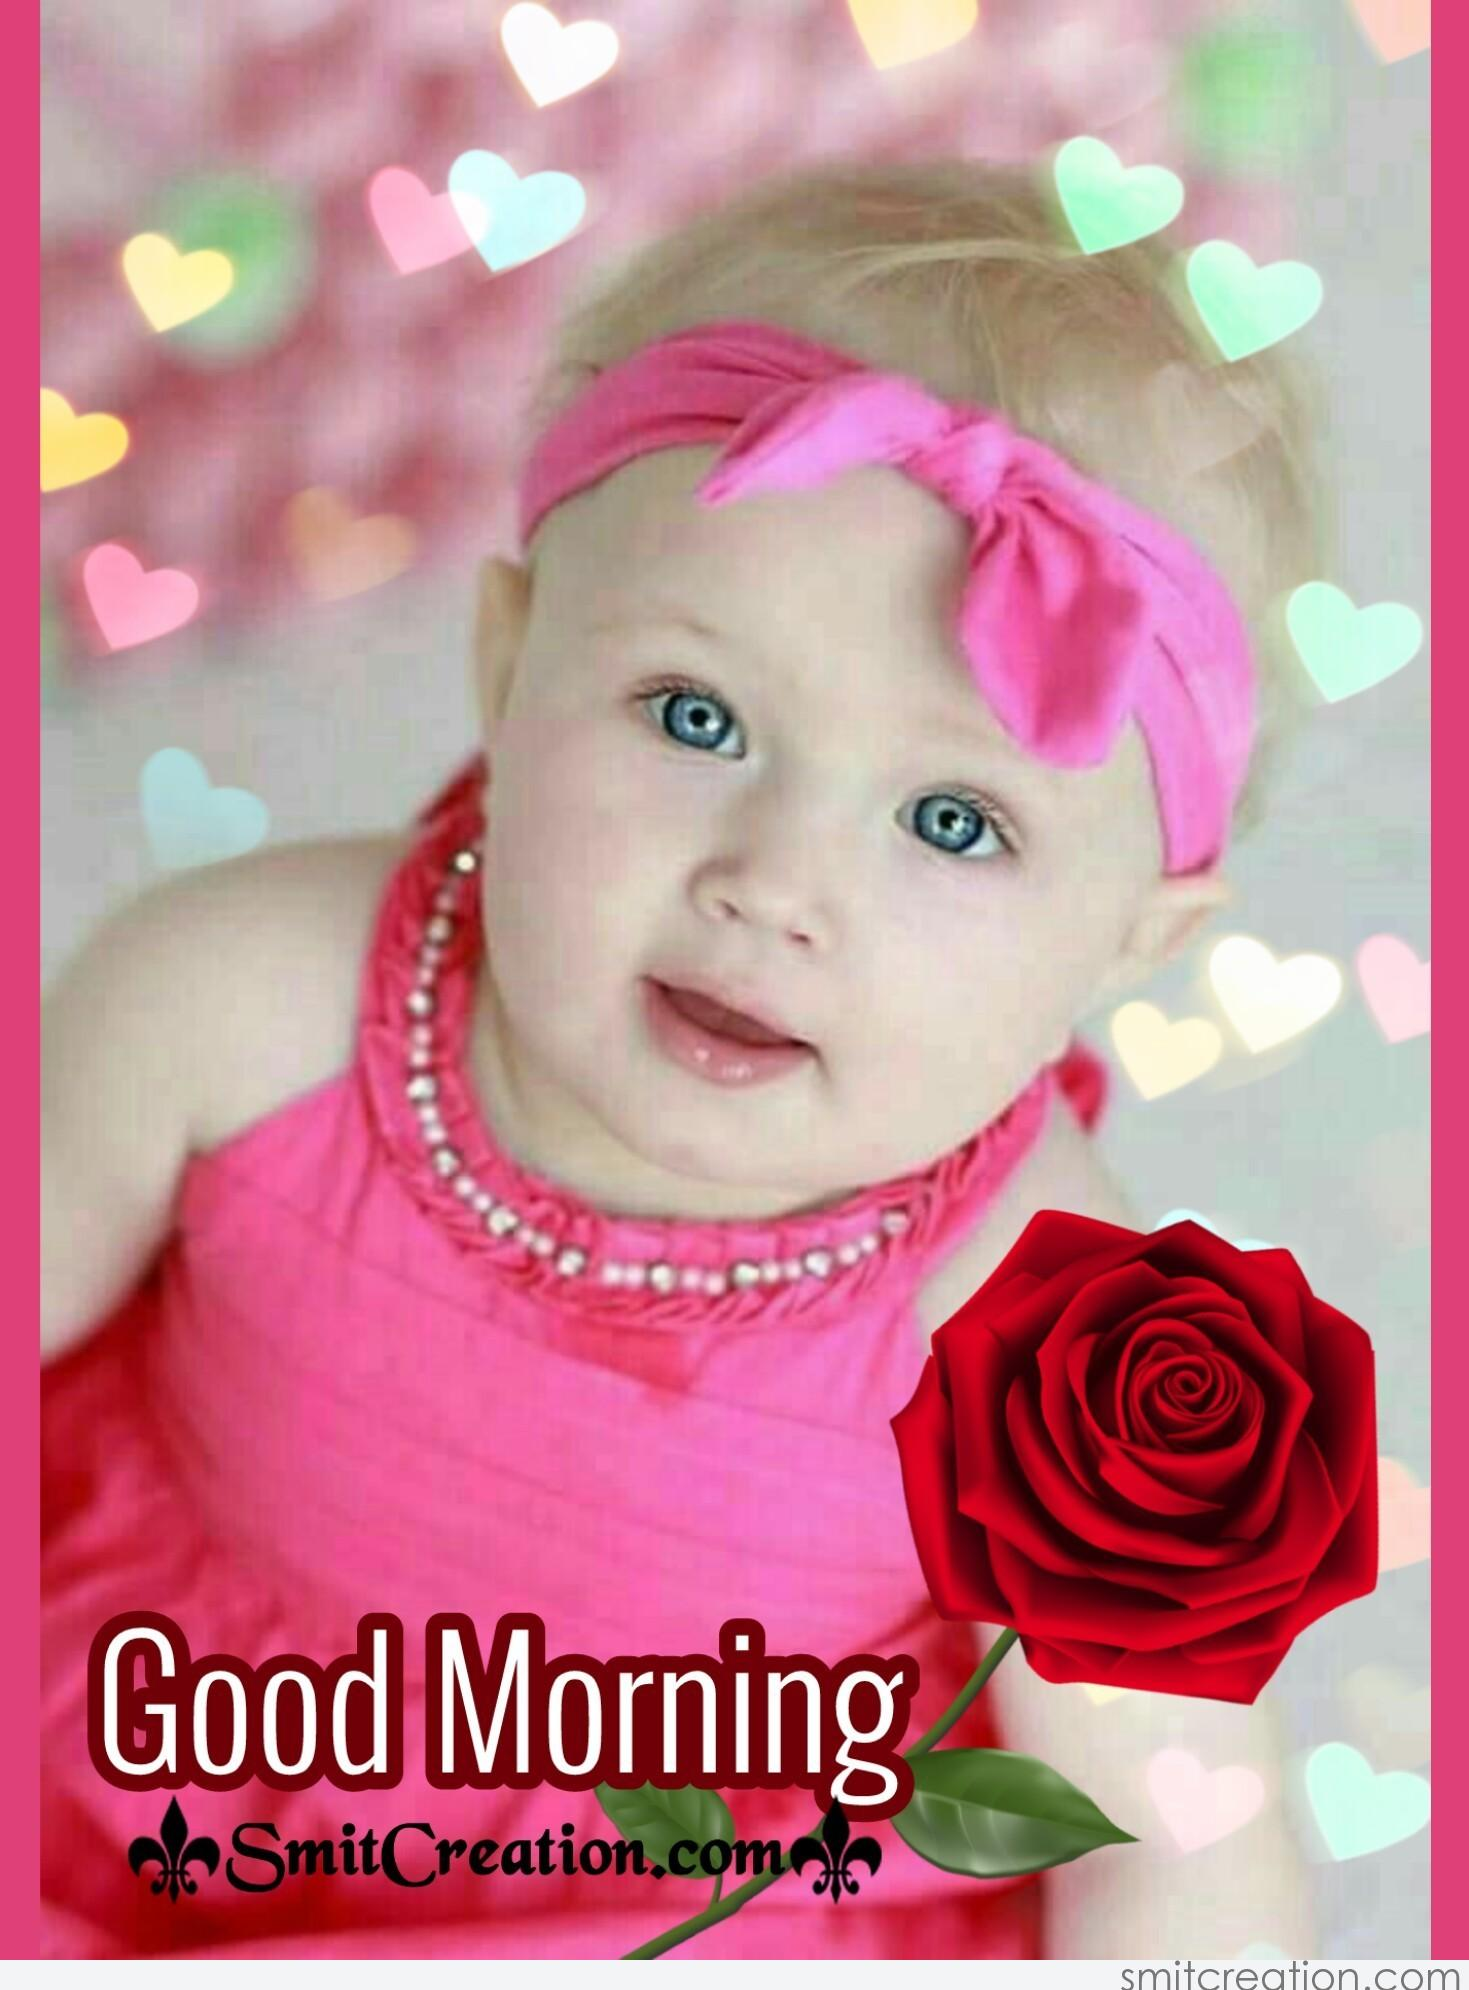 Good Morning Baby : Good morning baby smitcreation